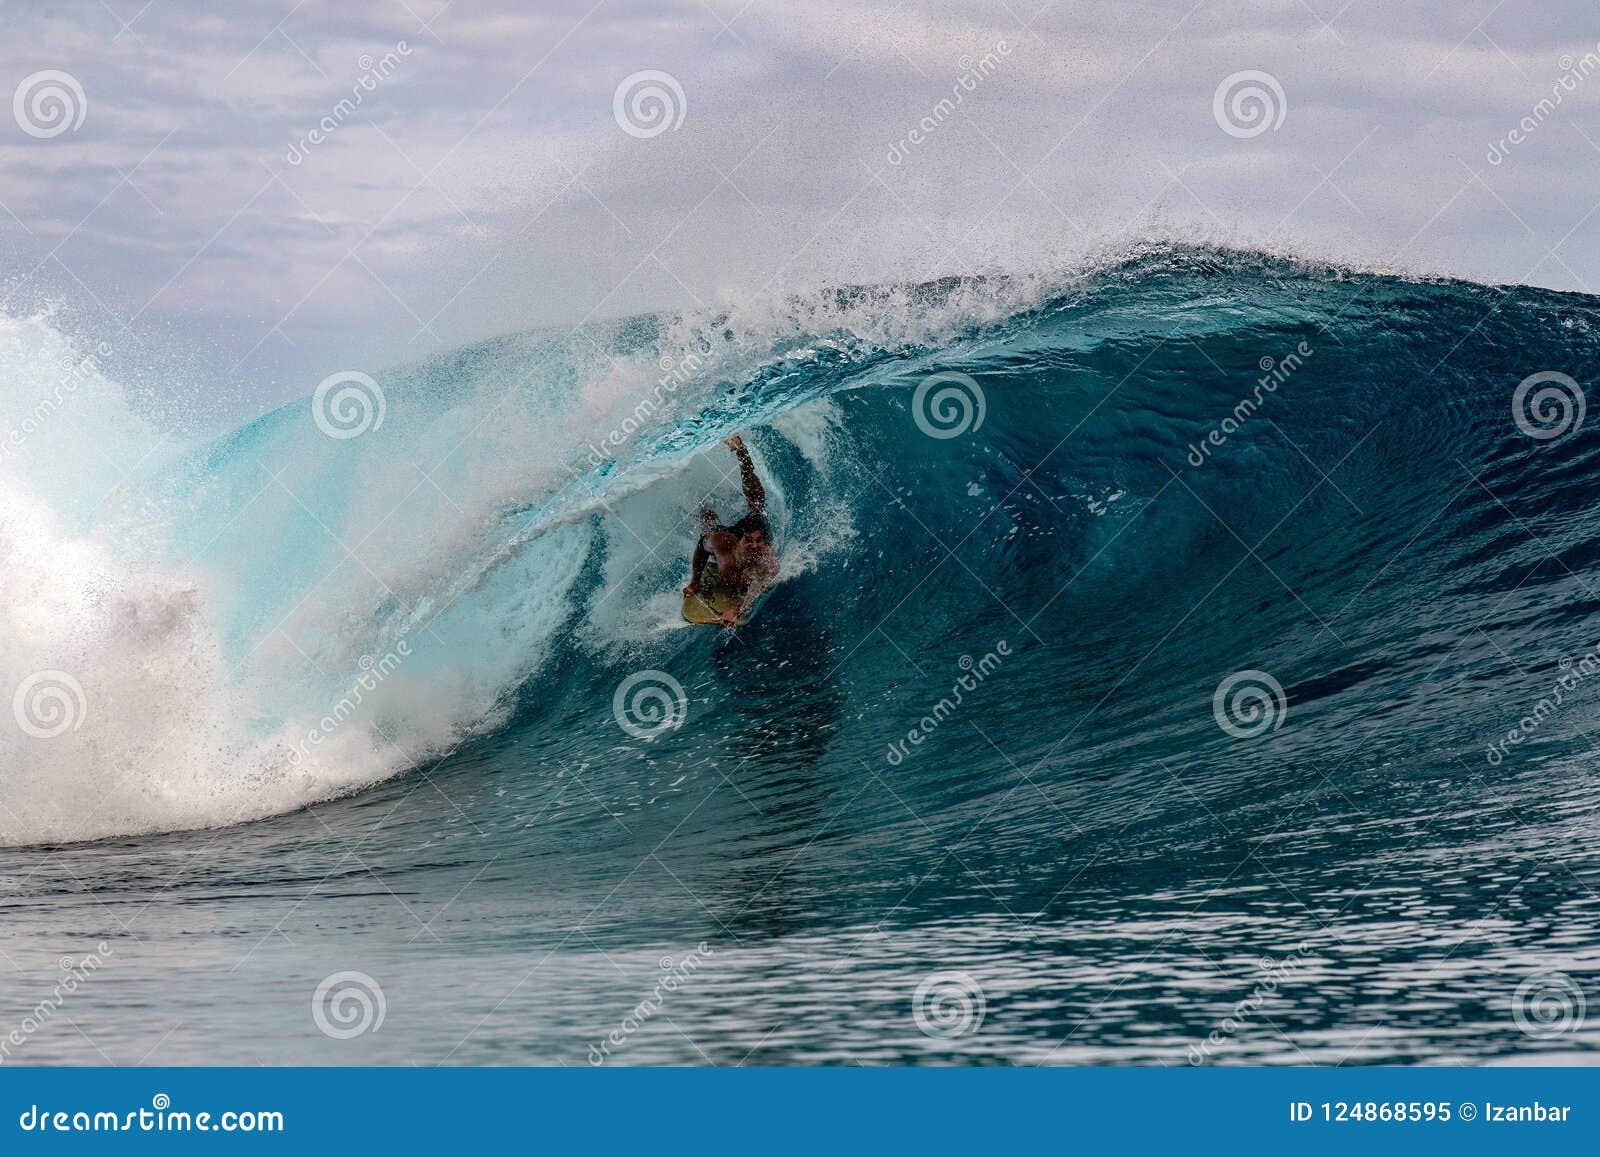 TAHITI, FRANZÖSISCH-POLYNESIEN - 5. August 2018 - Surfertraining Tage vor Wettbewerb Billabong Tahiti an Teahupoo-Riff